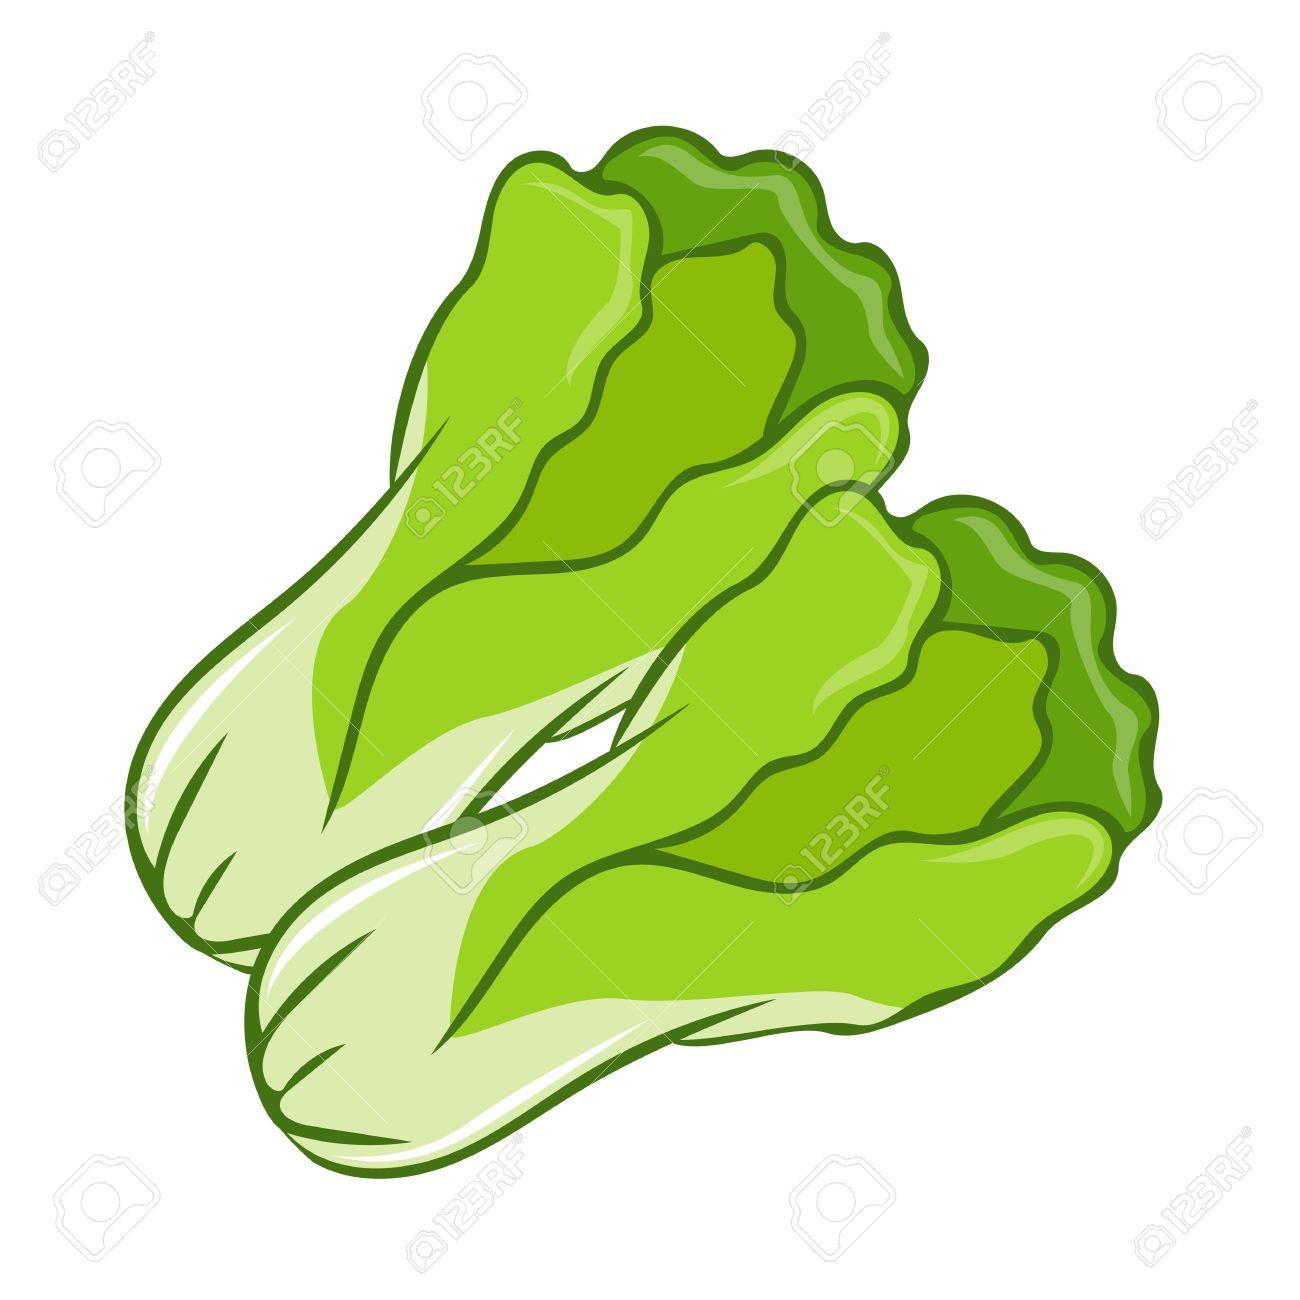 Green Lettuce cartoon isolated illustration on white background Stock Vector - 41528748